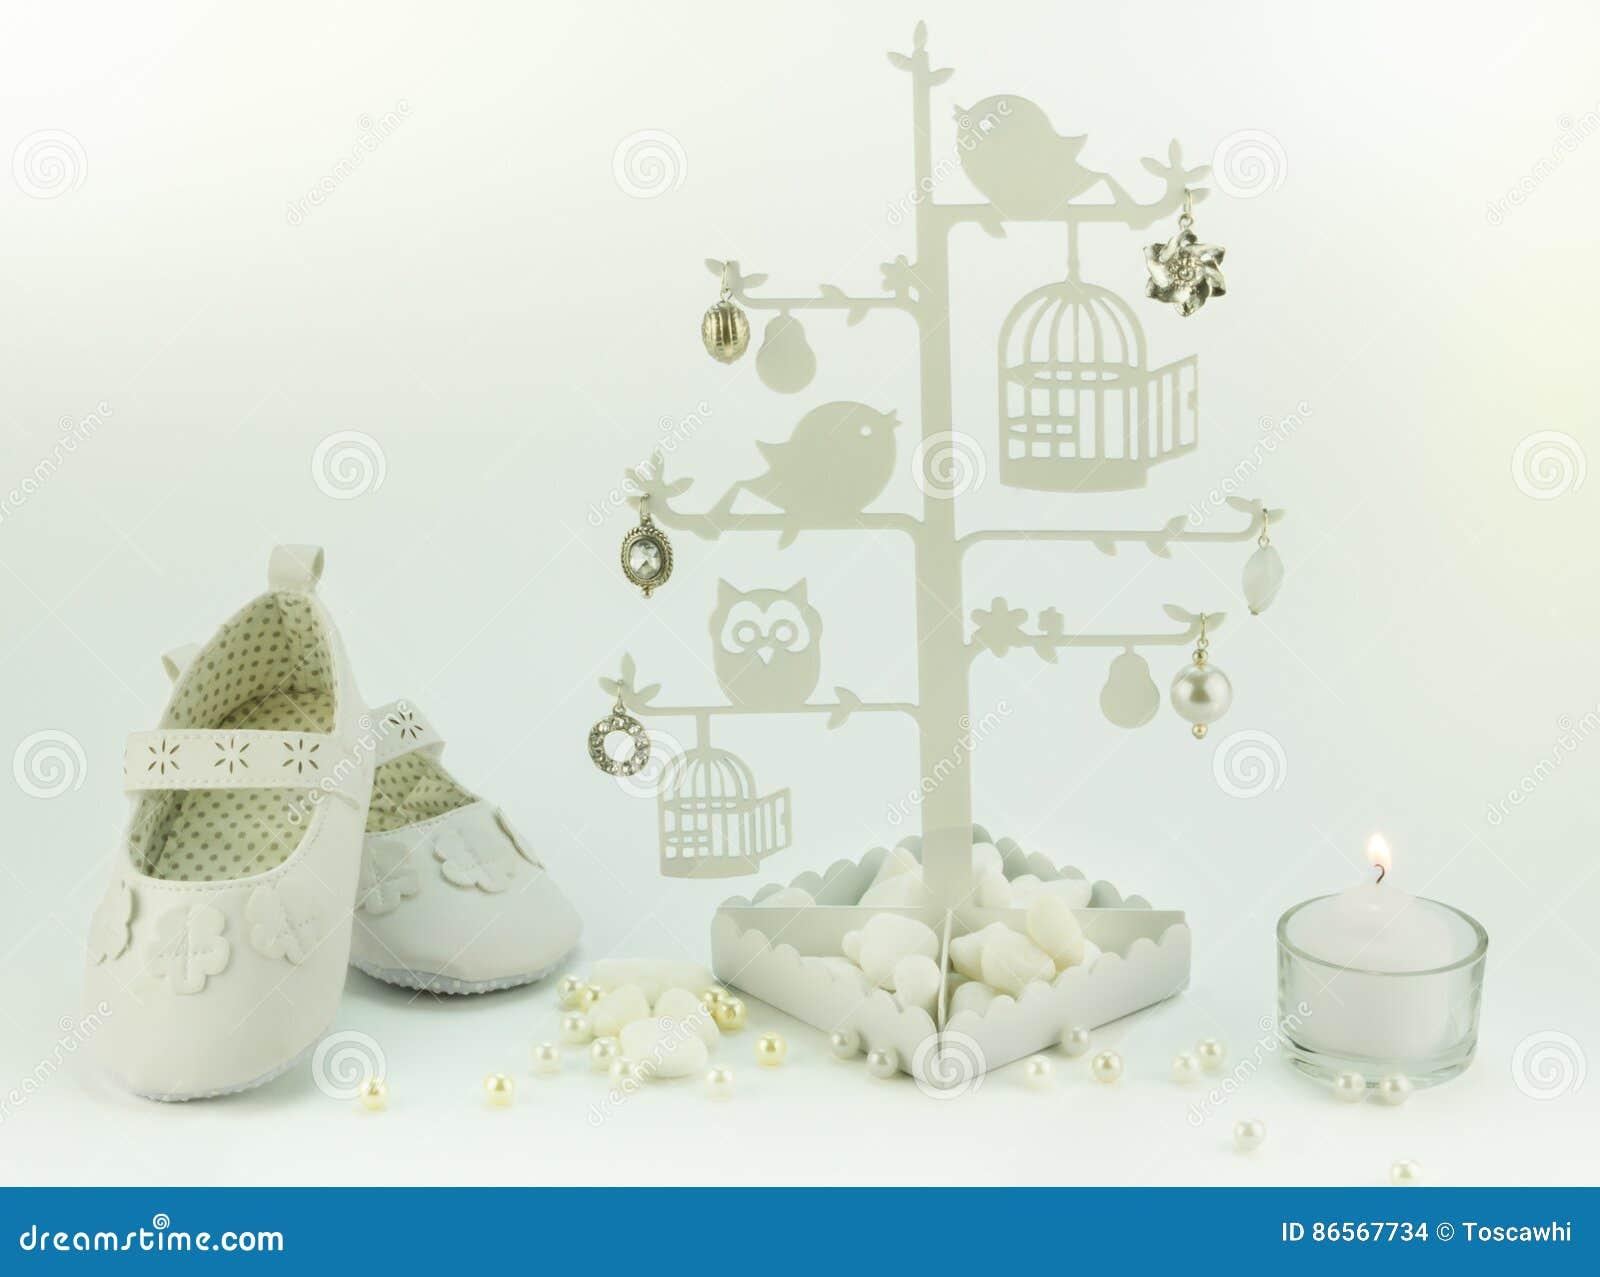 christening background white - photo #8